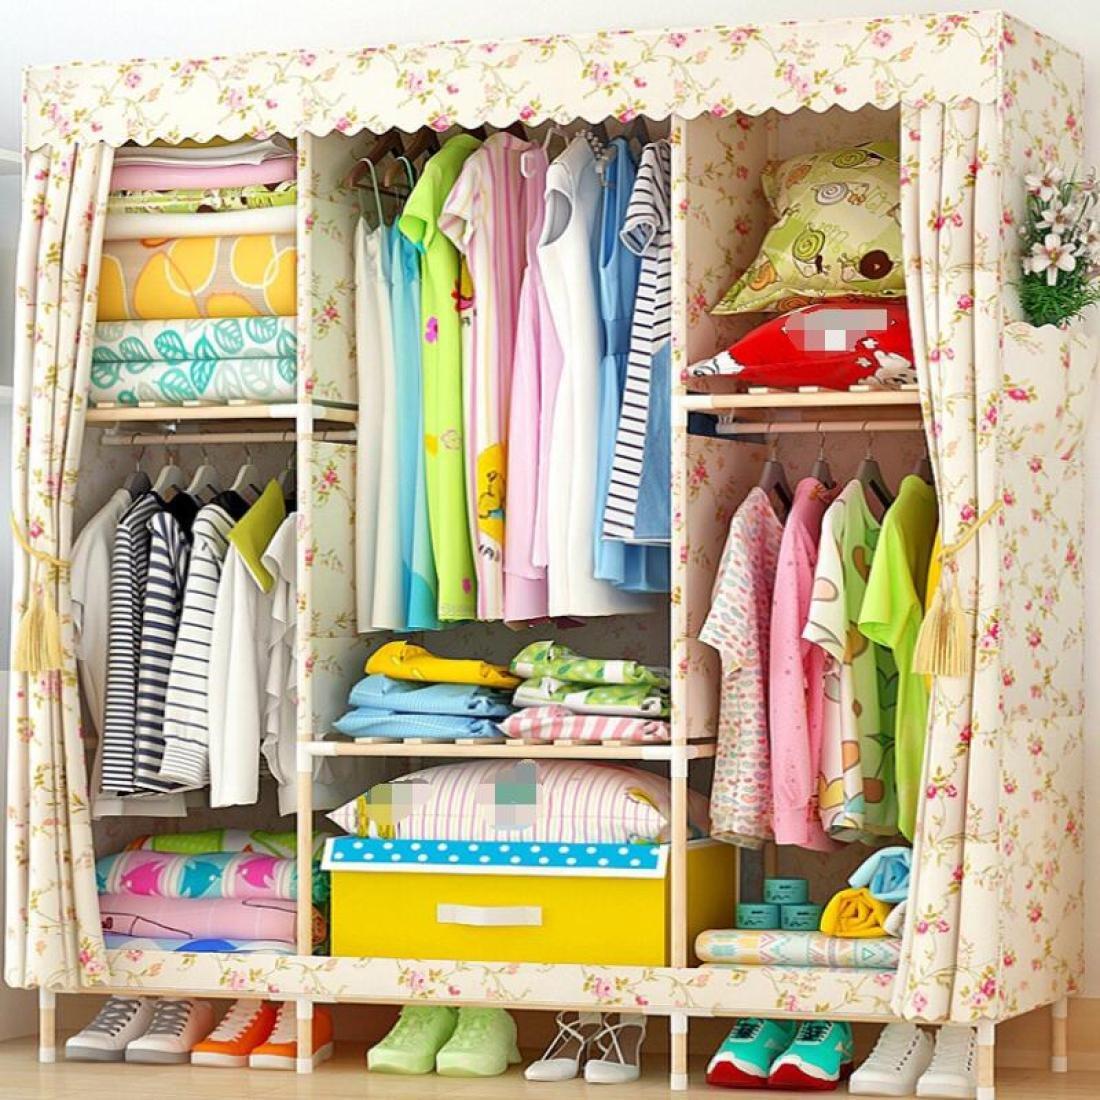 GL&G Portable Clothes Closet Oxford cloth Wardrobe Double Rod Storage Organizer Bedroom Wardrobes Clothing & Wardrobe Storage Foldable Closets,C,67''58''